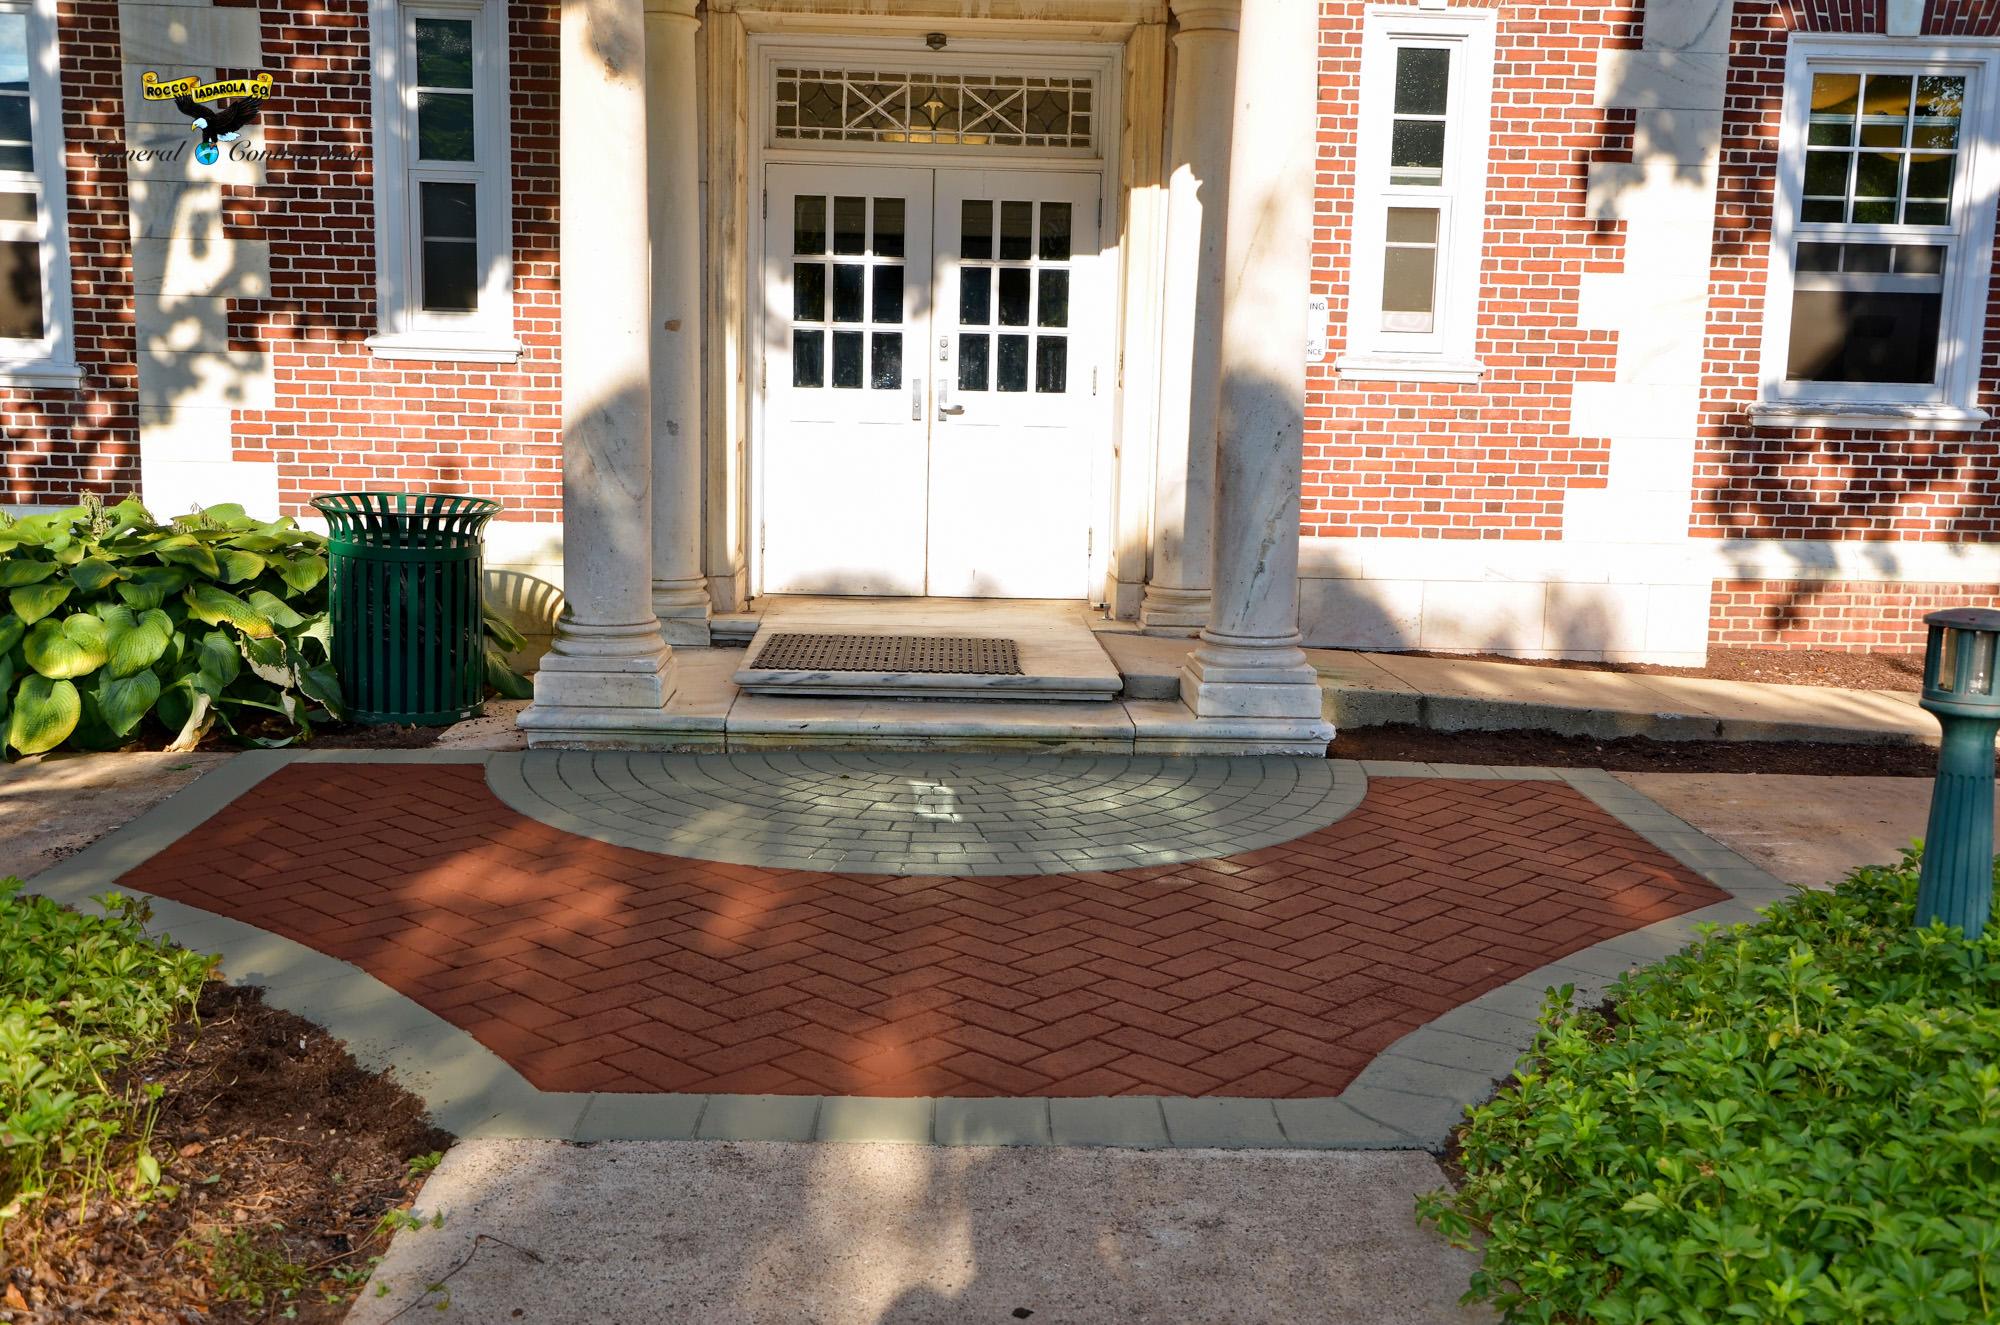 Marcus White Hall CCSU Central Connecticut State University Rocco Iadarola Asphalting-111.jpg